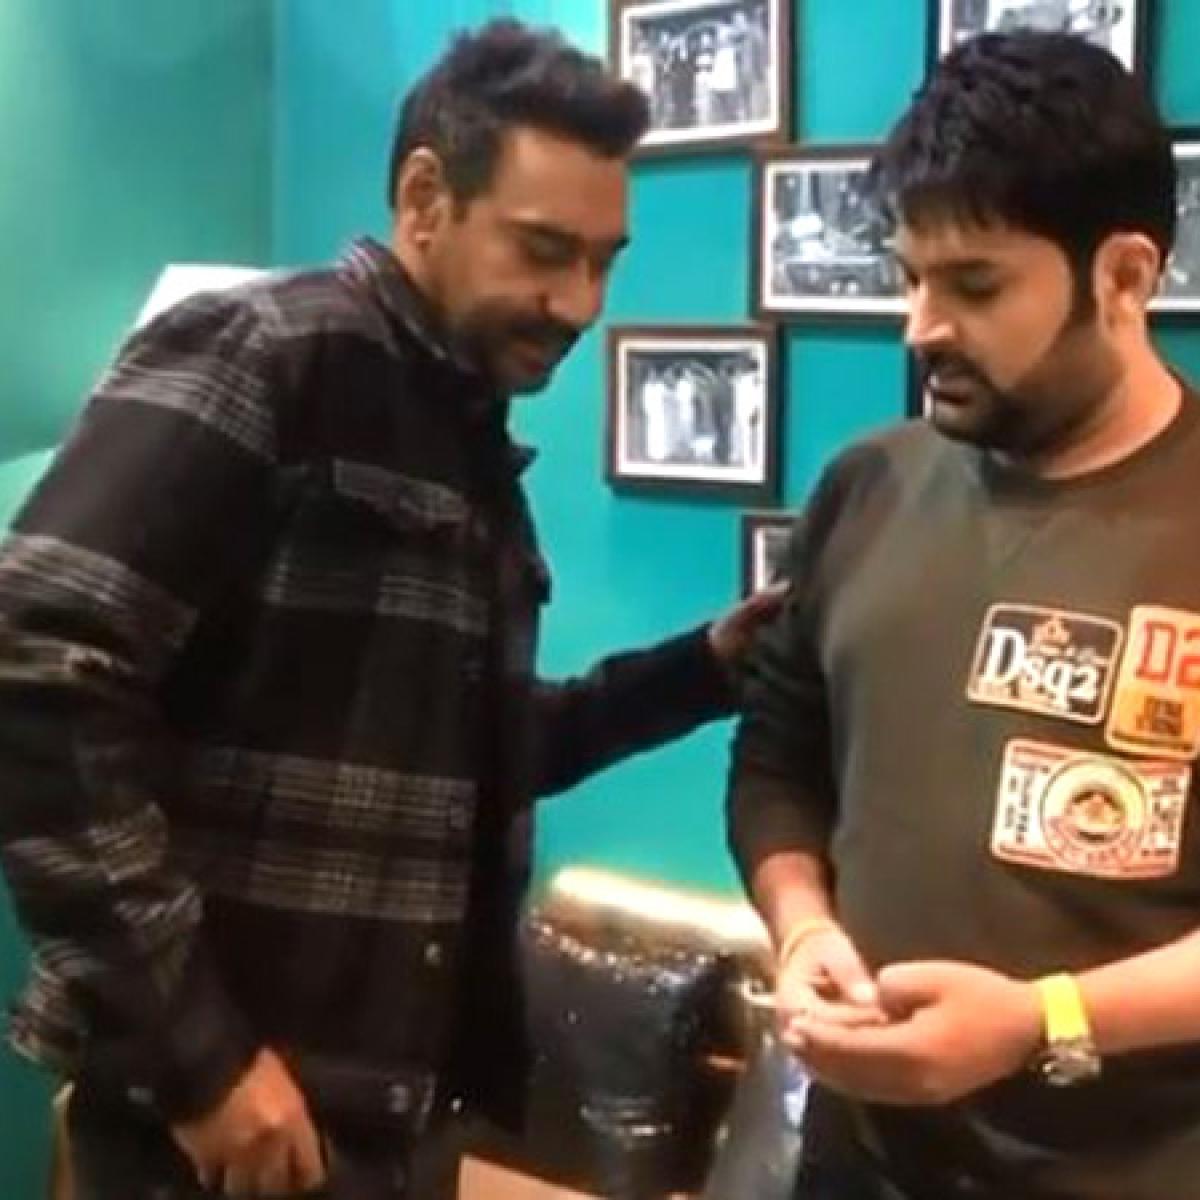 Corruption is everywhere: Ajay Devgn caught bribing Kapil Sharma to promote 'Tanhaji: The Unsung Warrior'